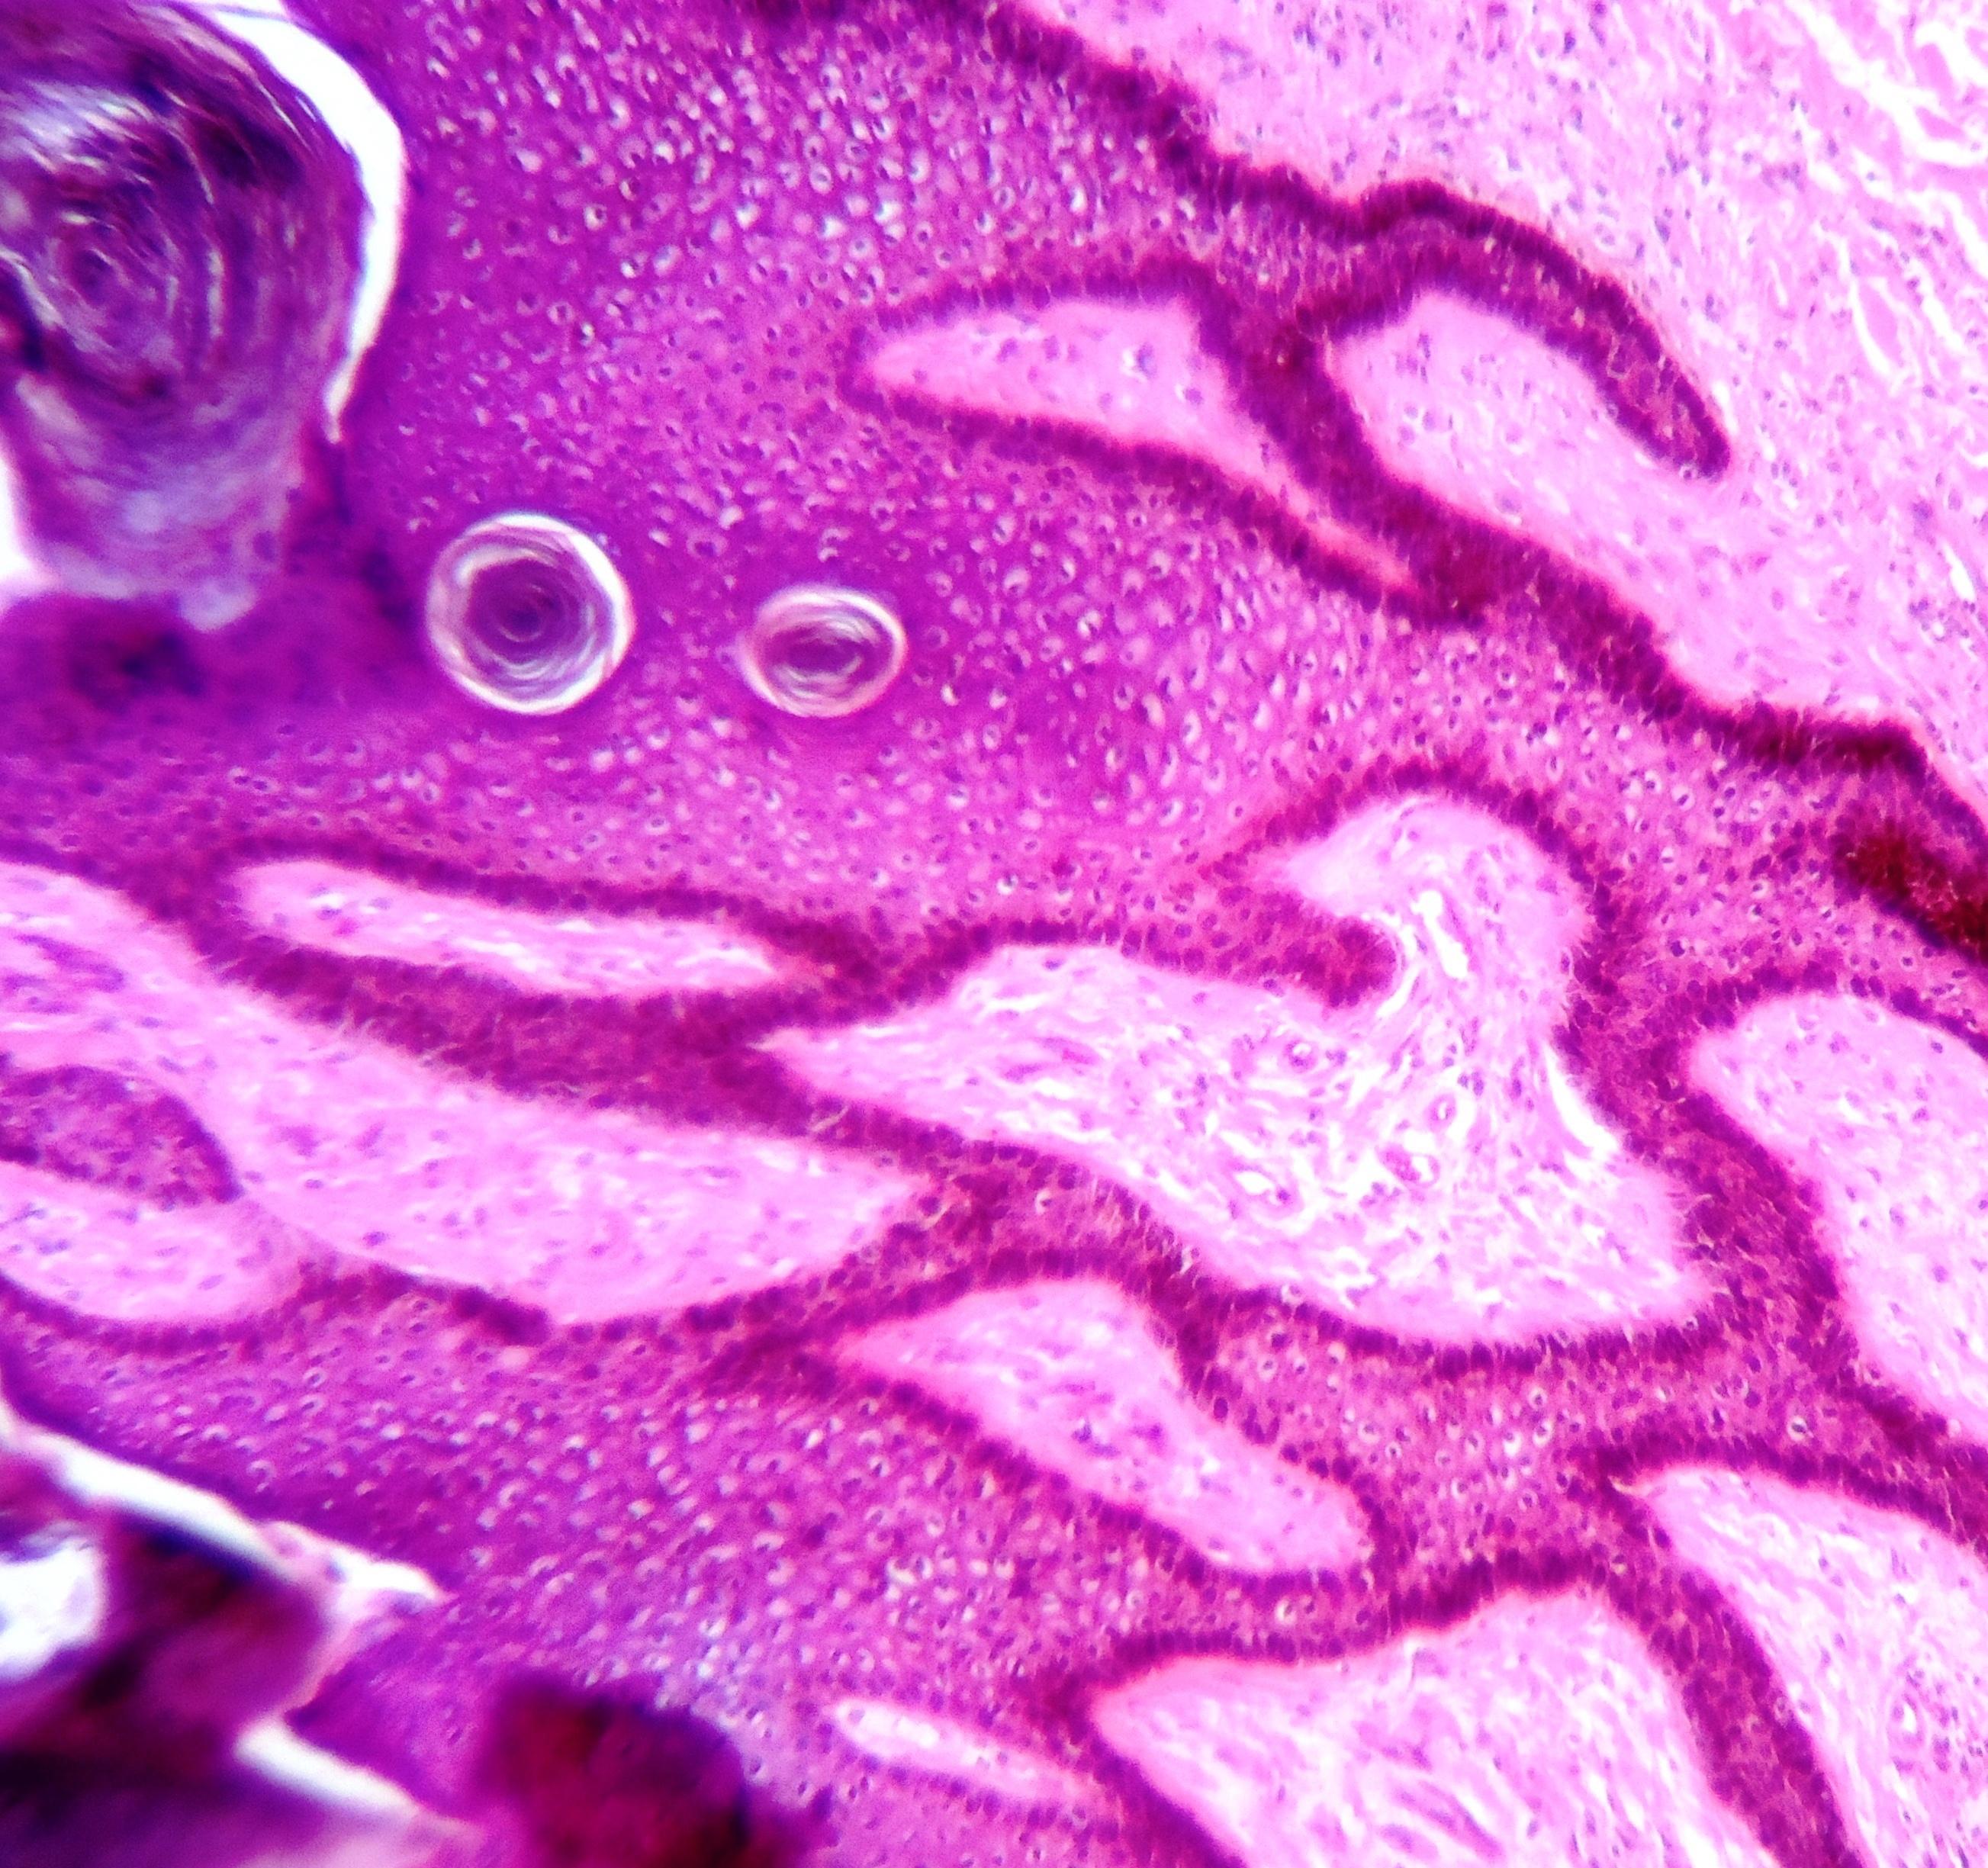 kis condyloma a karon hím HPV rákok